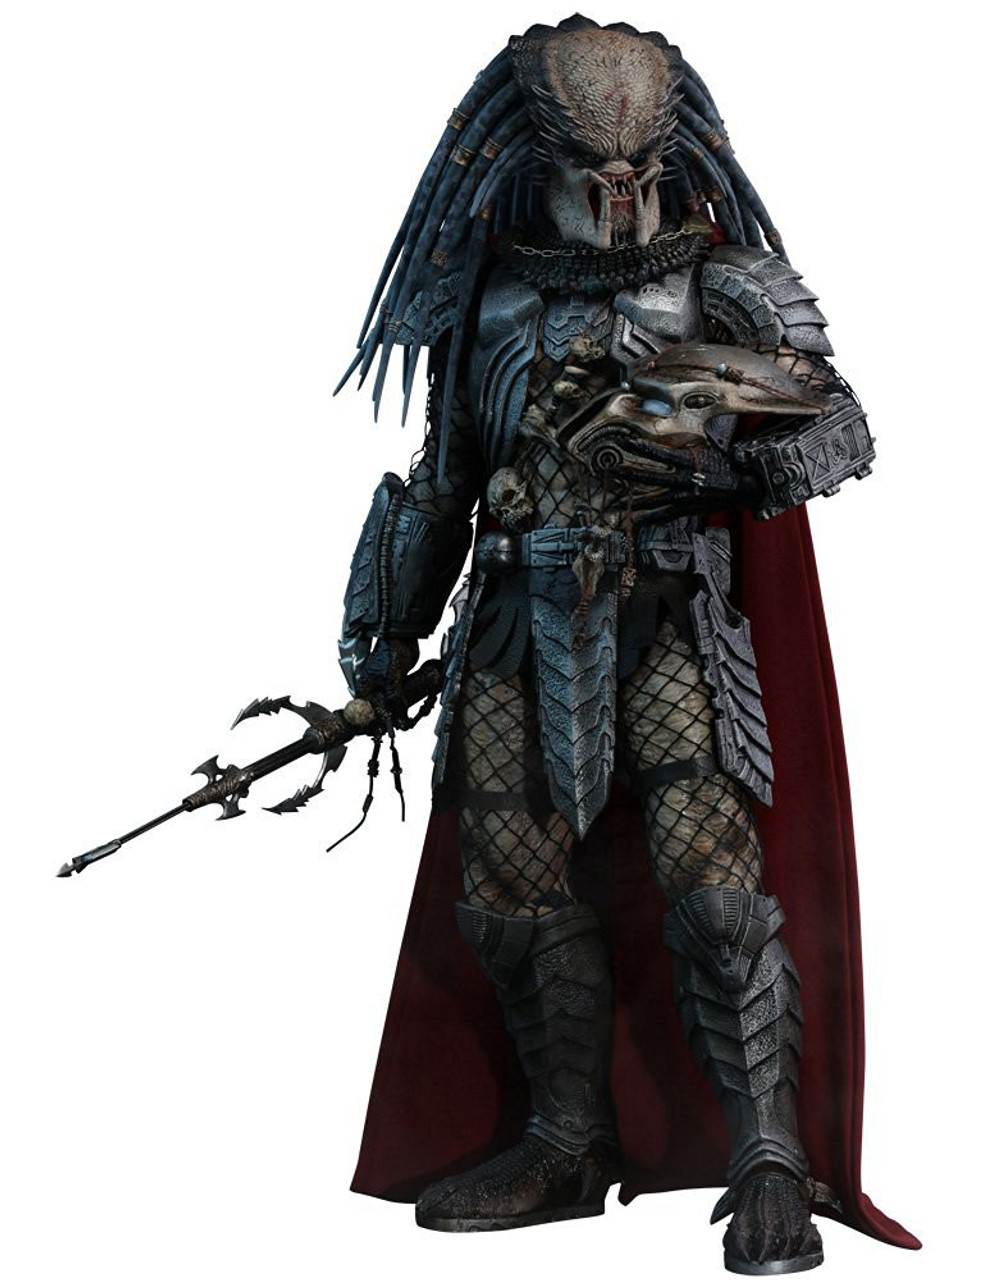 Alien Vs. Predator Movie Masterpiece Elder Predator 1/6 Collectible Figure [2016 Version]